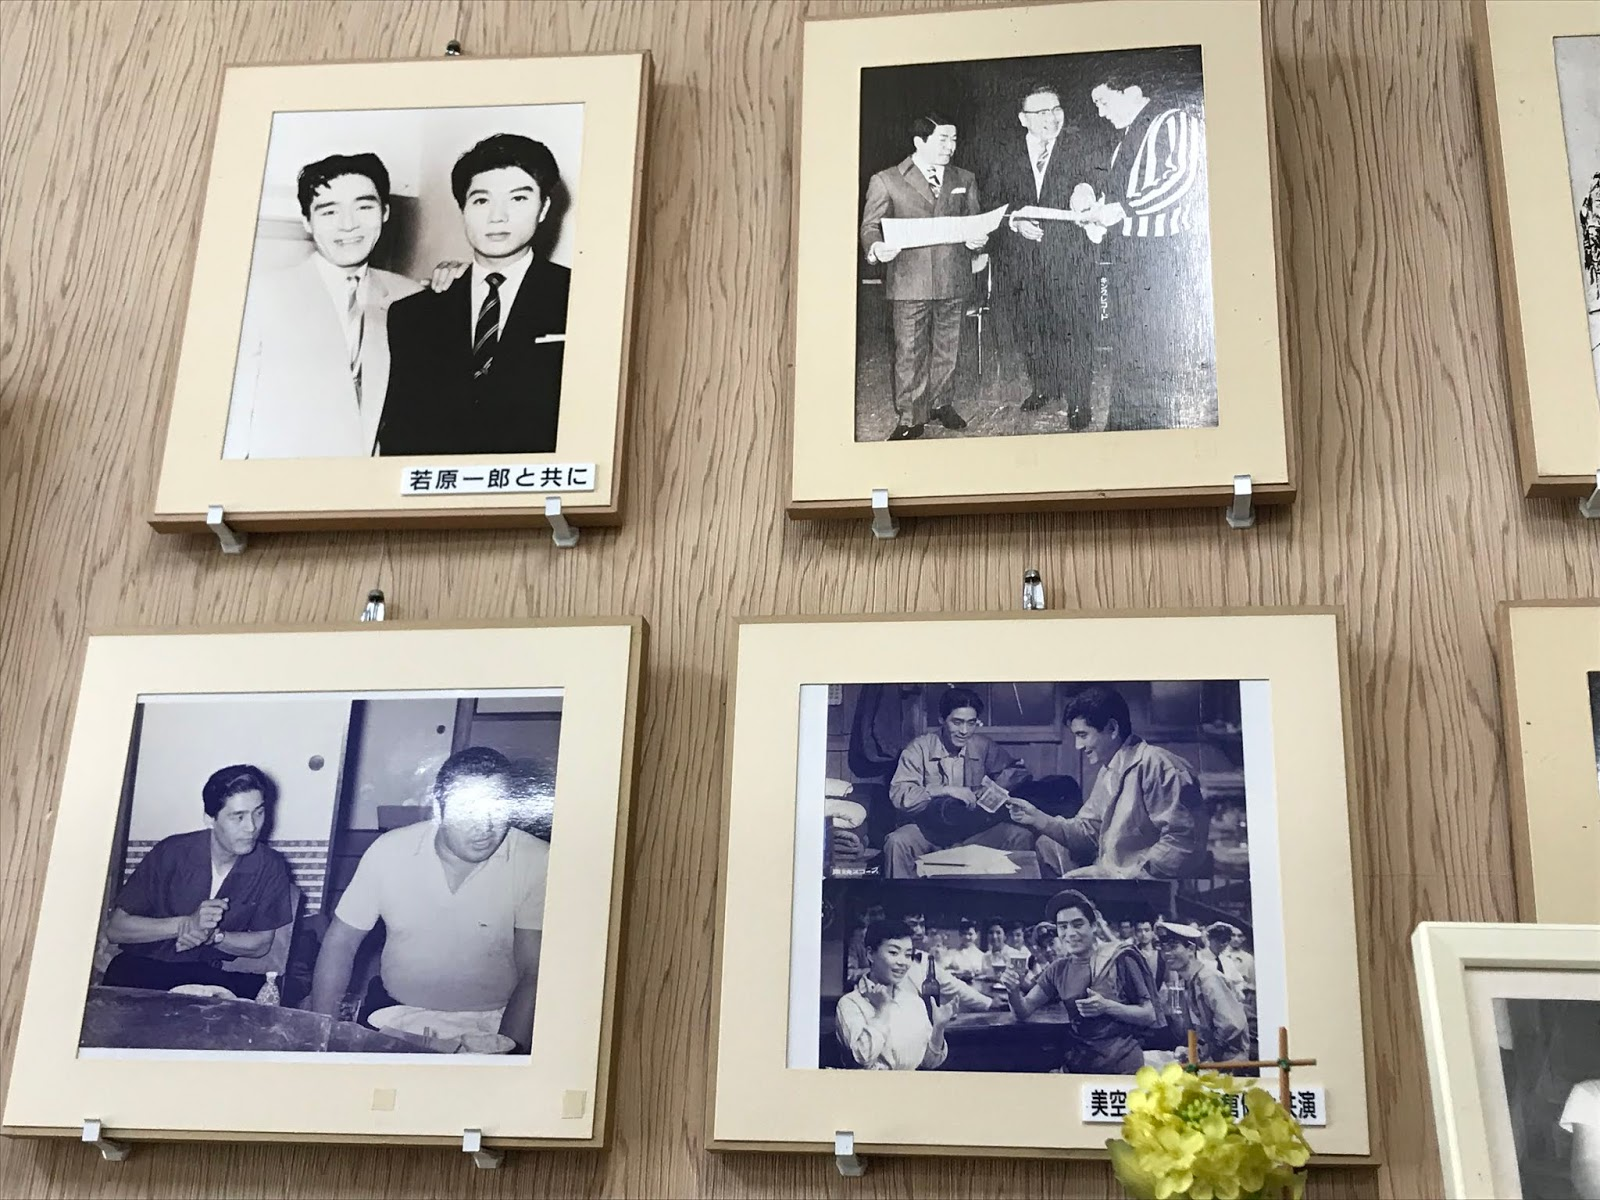 Yoji Ishikawa Noir Yoji ishikawa photo library (Japanese Edition)